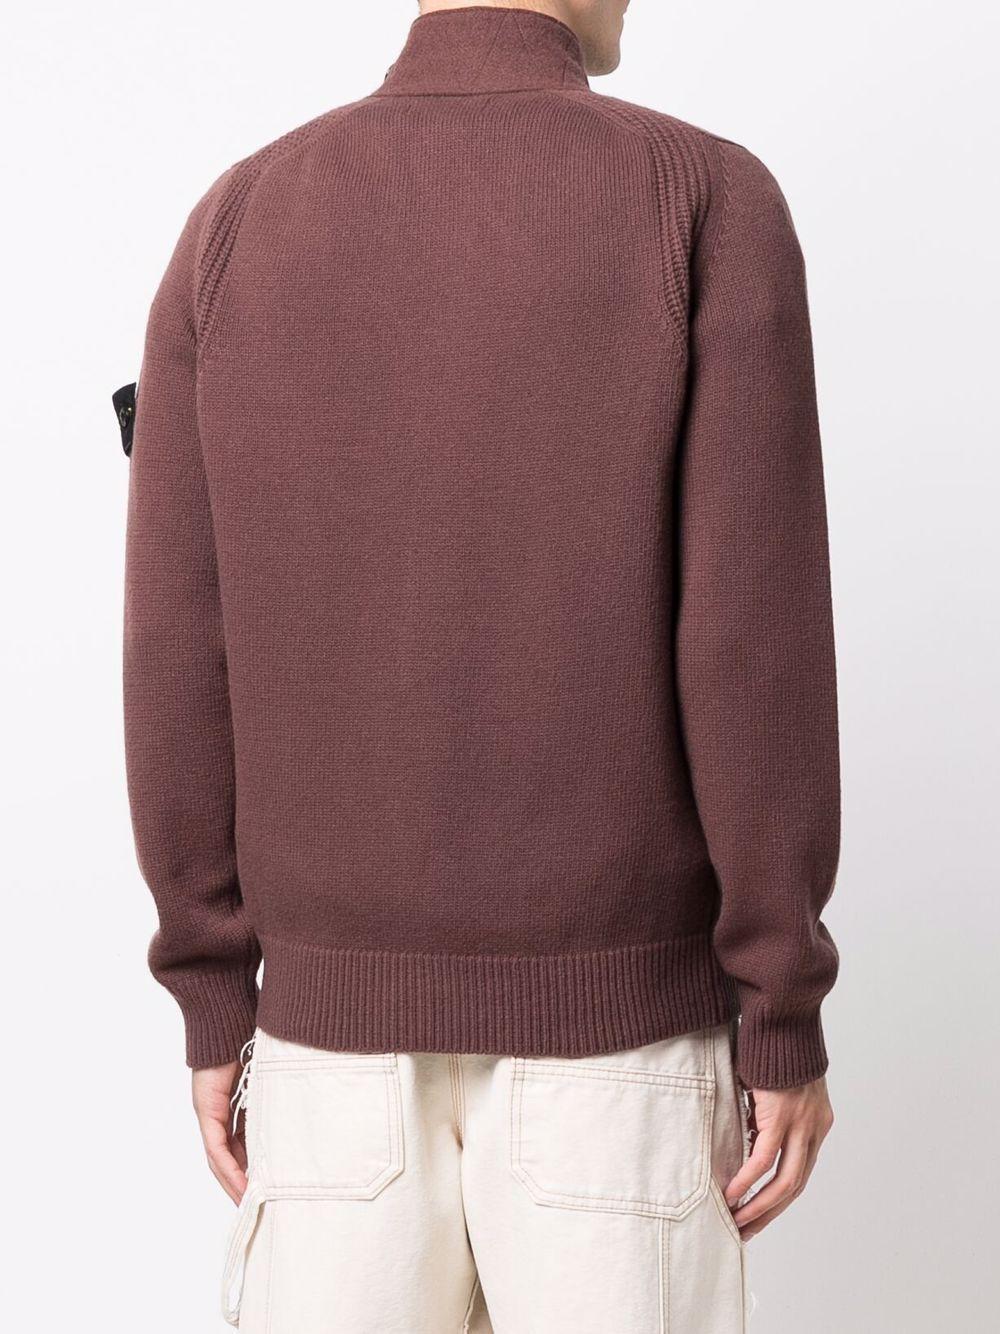 cardigan marrone in lana con bottoni e logo Stone Island sulla manica STONE ISLAND   Cardigan   7515547A3V0076